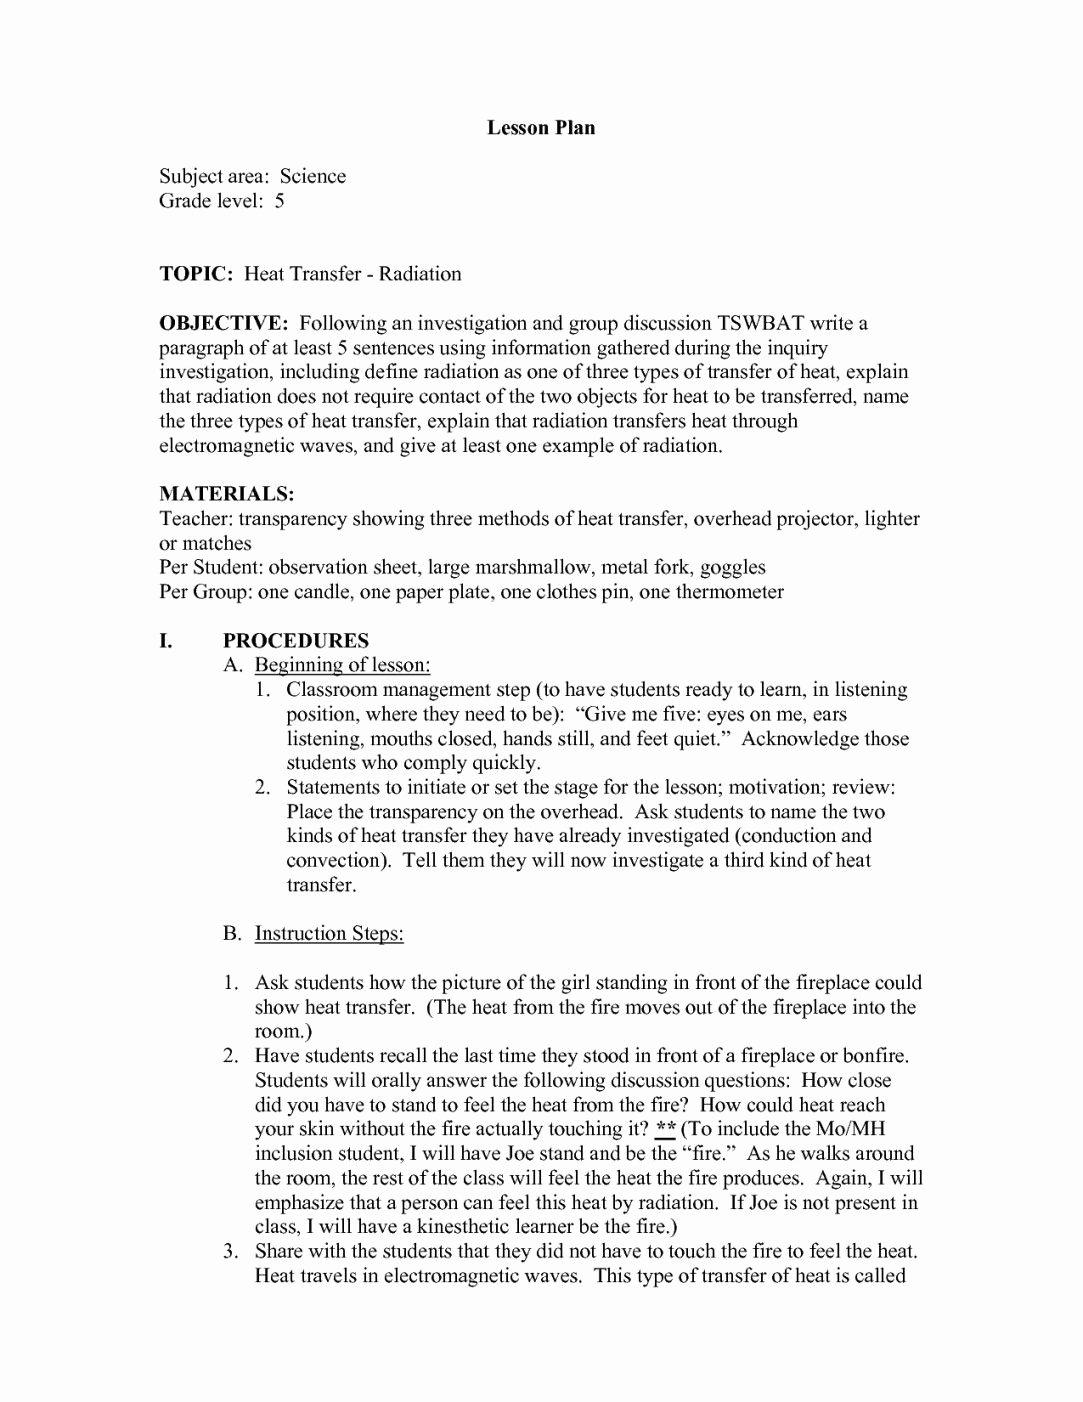 Worksheet Methods Of Heat Transfer Elegant Worksheet Methods Heat Transfer